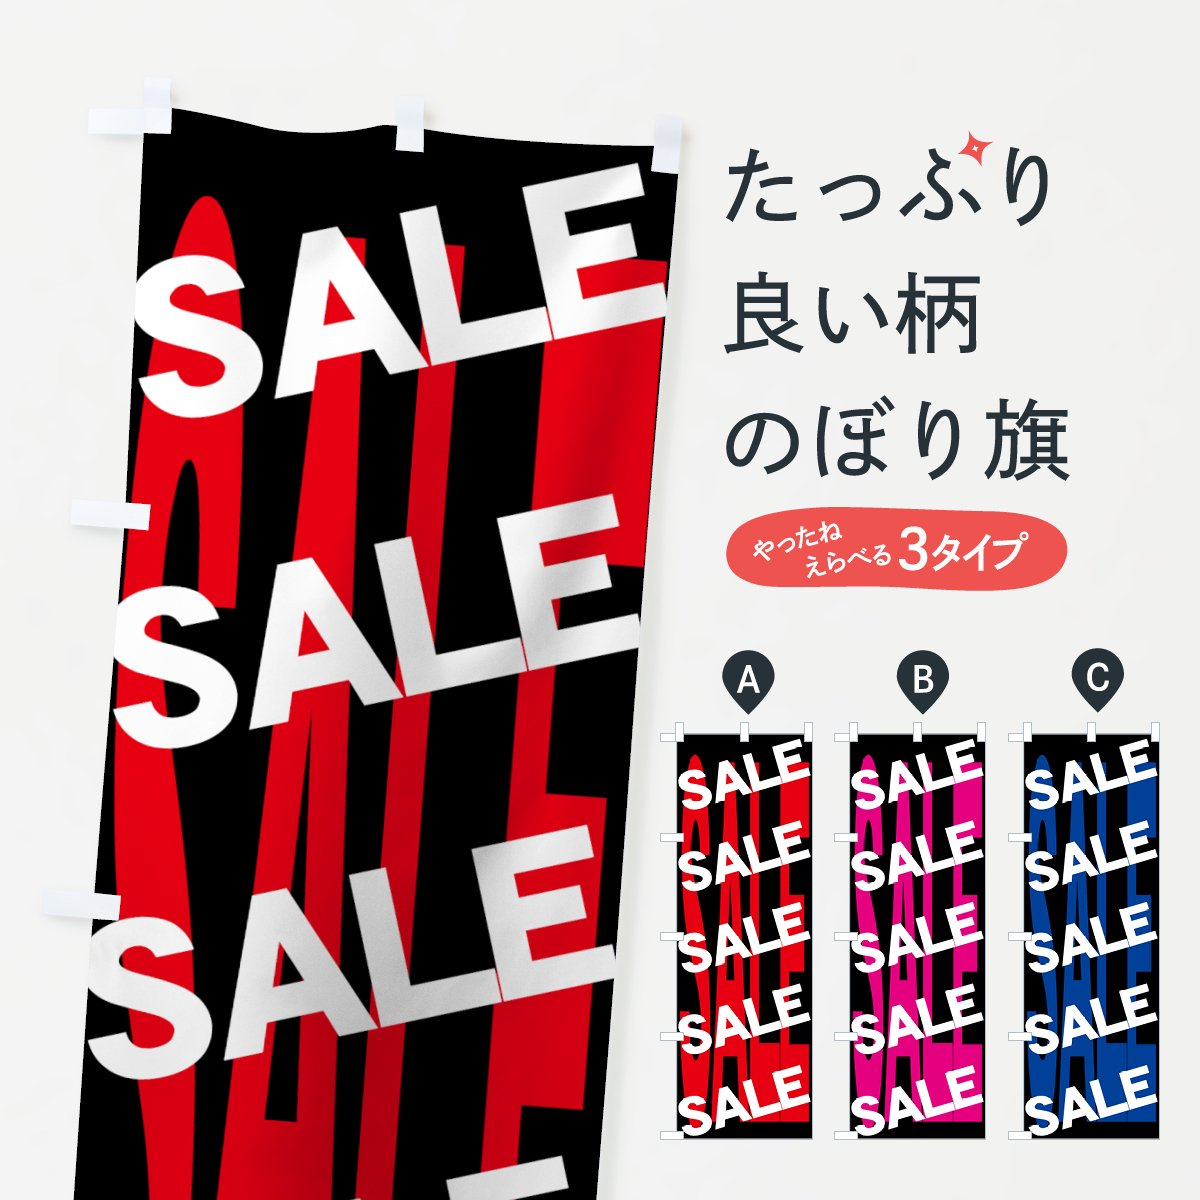 SALEのぼり旗 SALE SALE SALE SALE